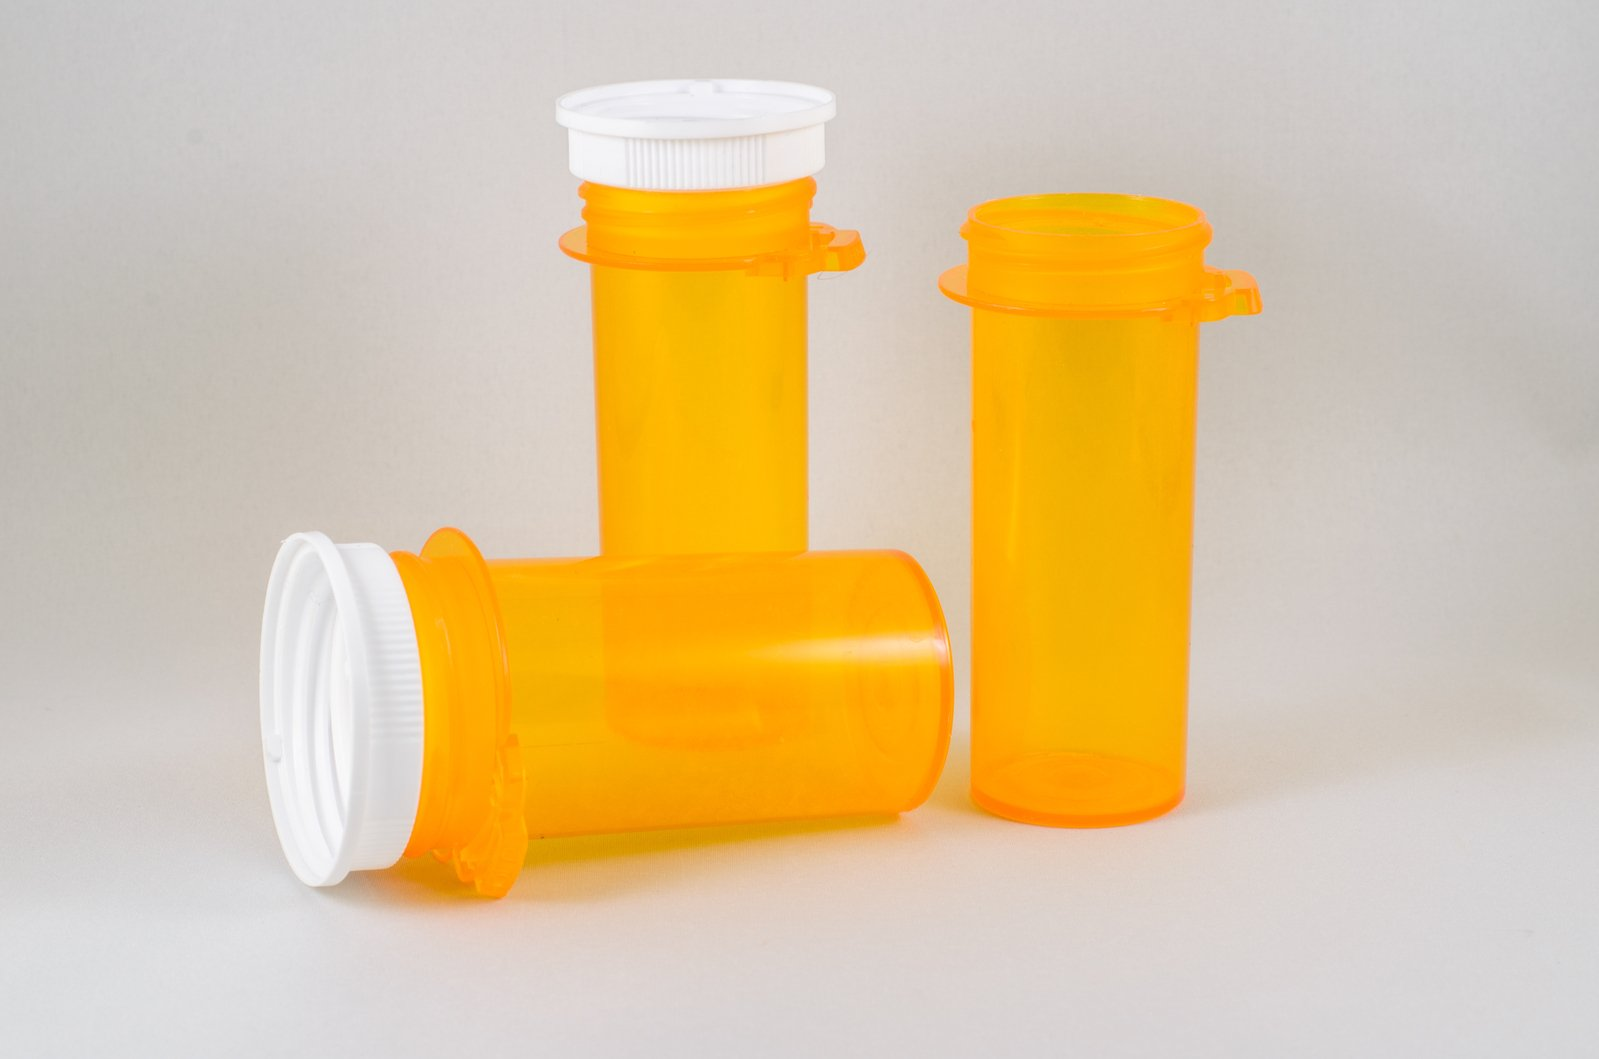 Free empty prescription bottles stock photo for What to do with empty prescription bottles